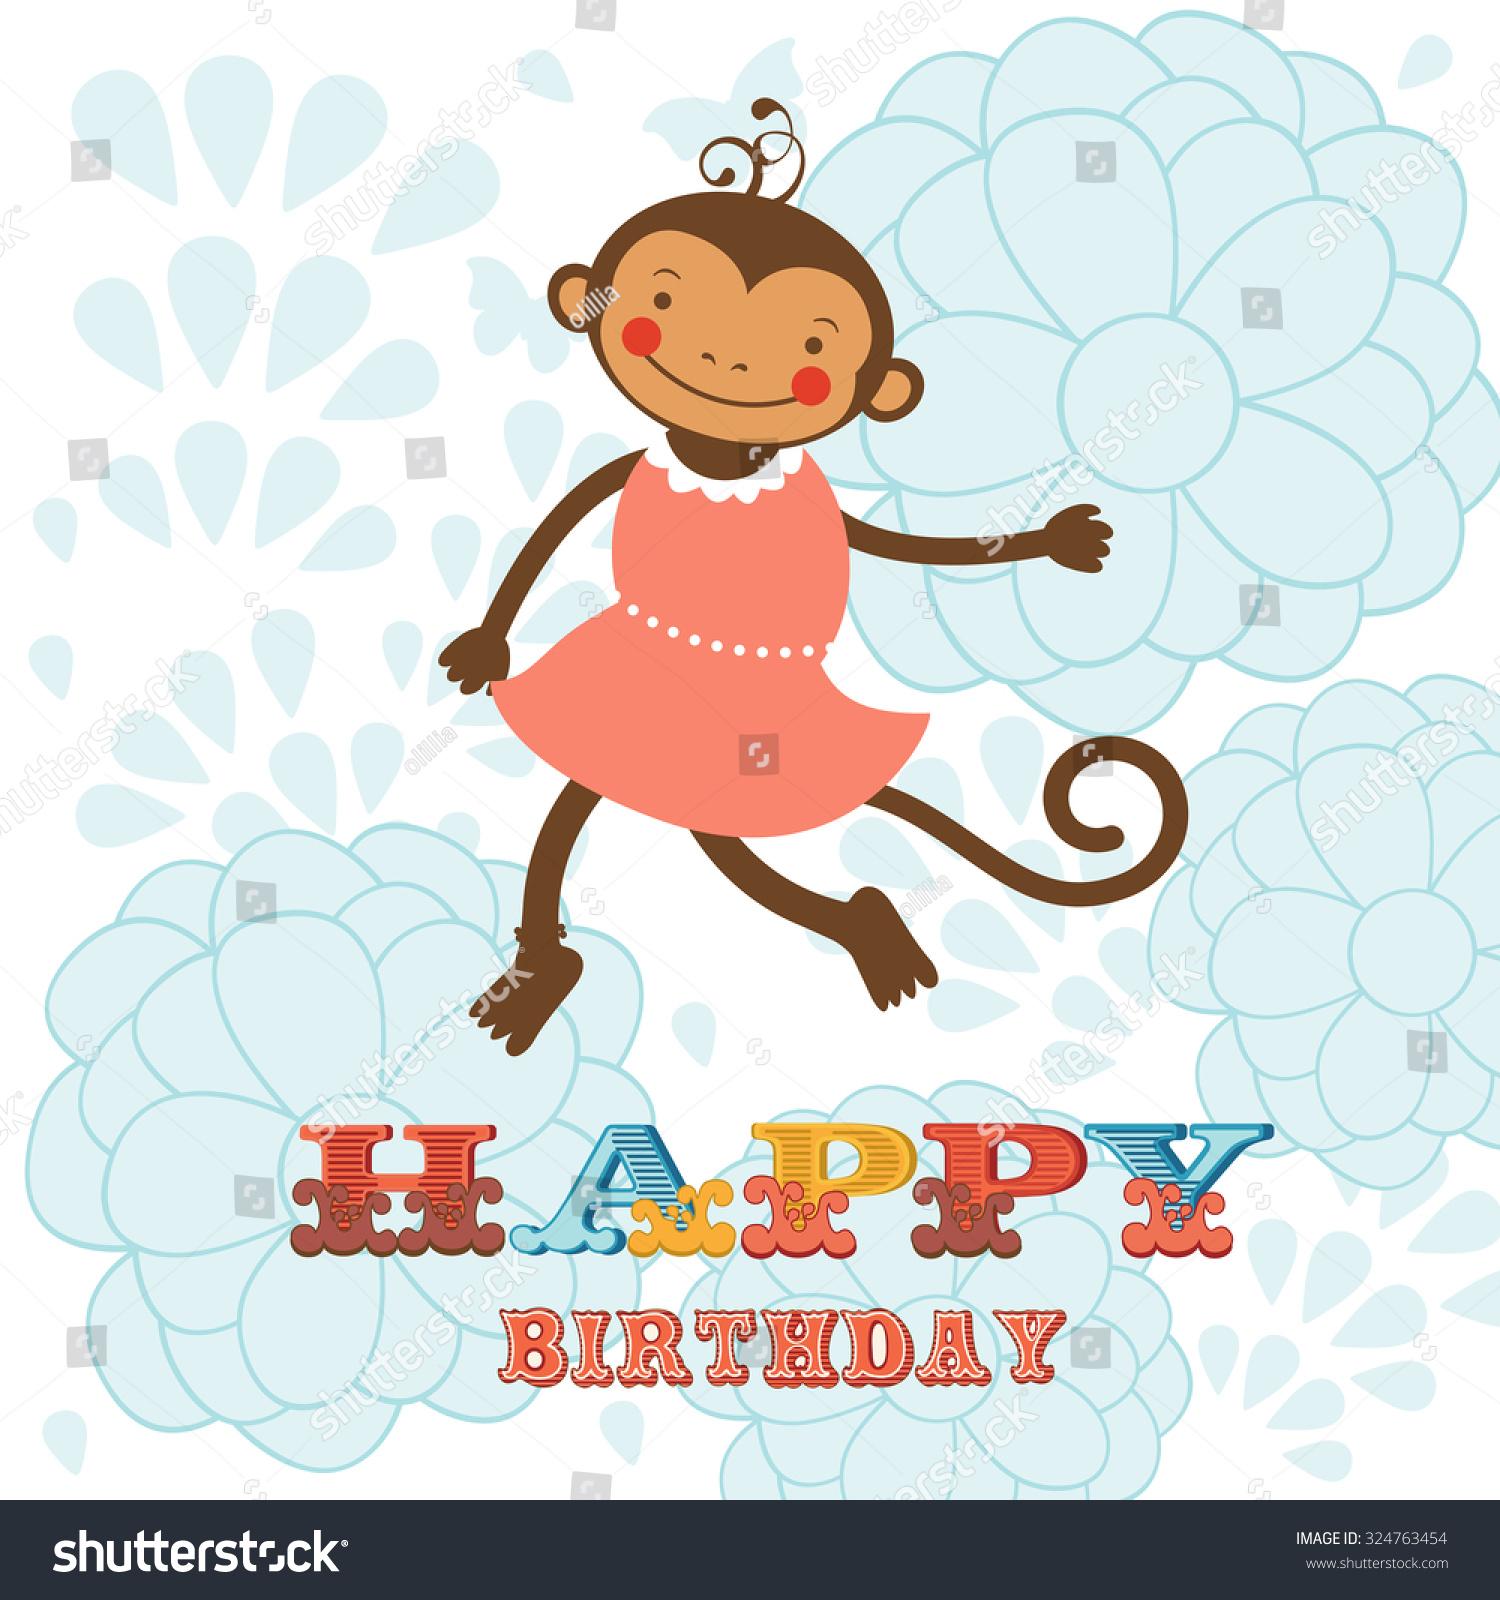 Happy birthday to you обезьяны открытка 33